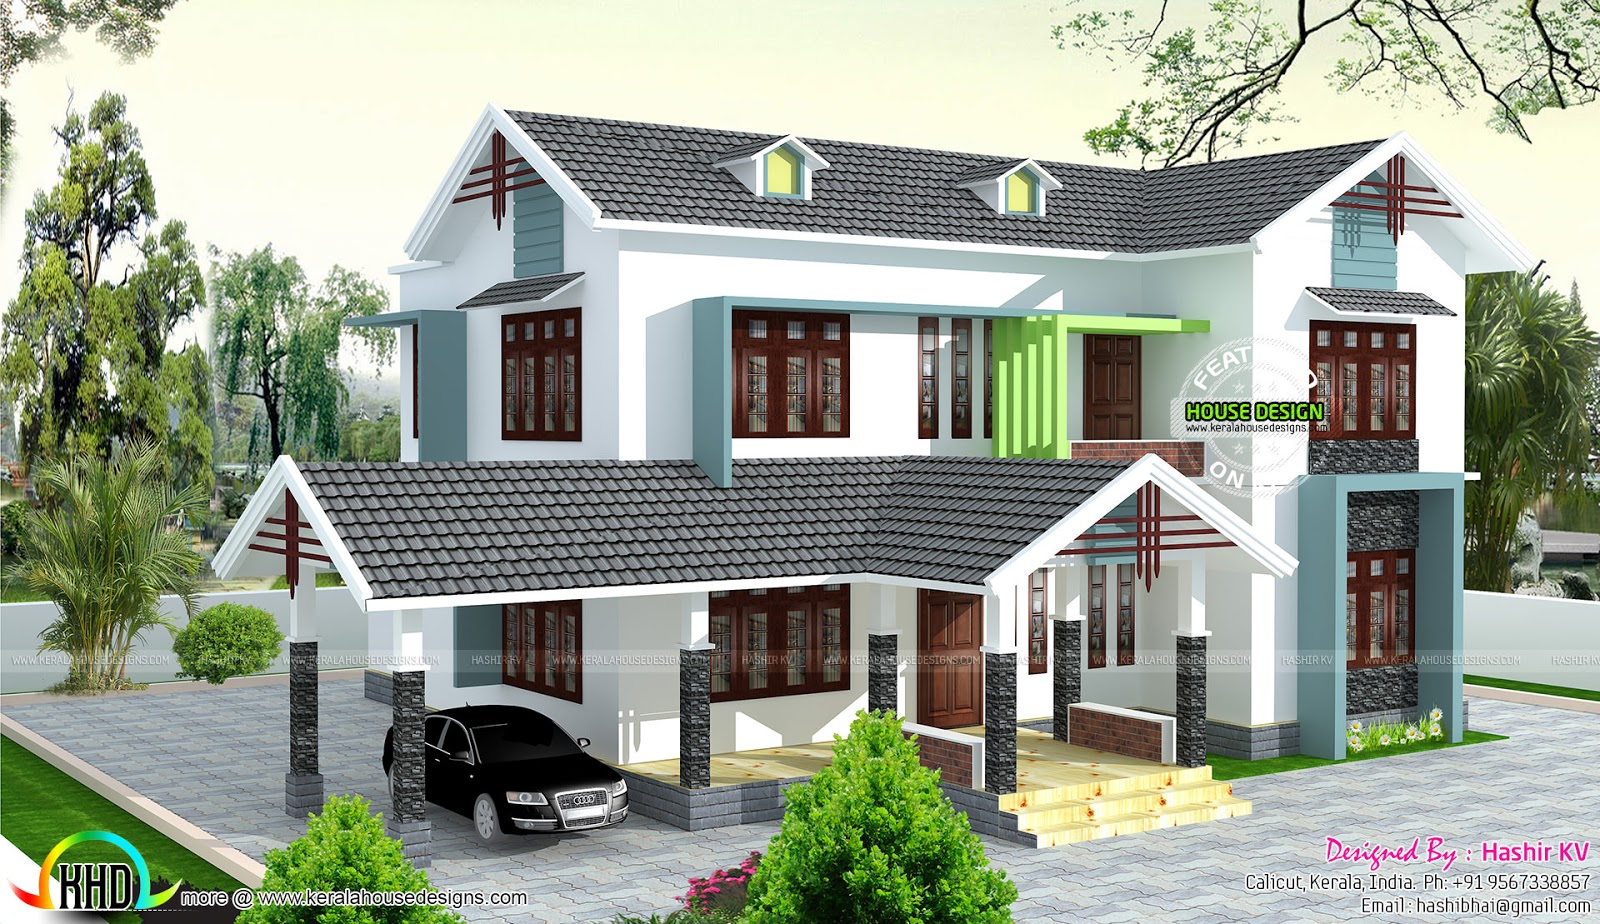 Modern 5 Bedroom House Designs 5 Bedroom House By Hashir Kv Kerala Home Design And Floor Plans